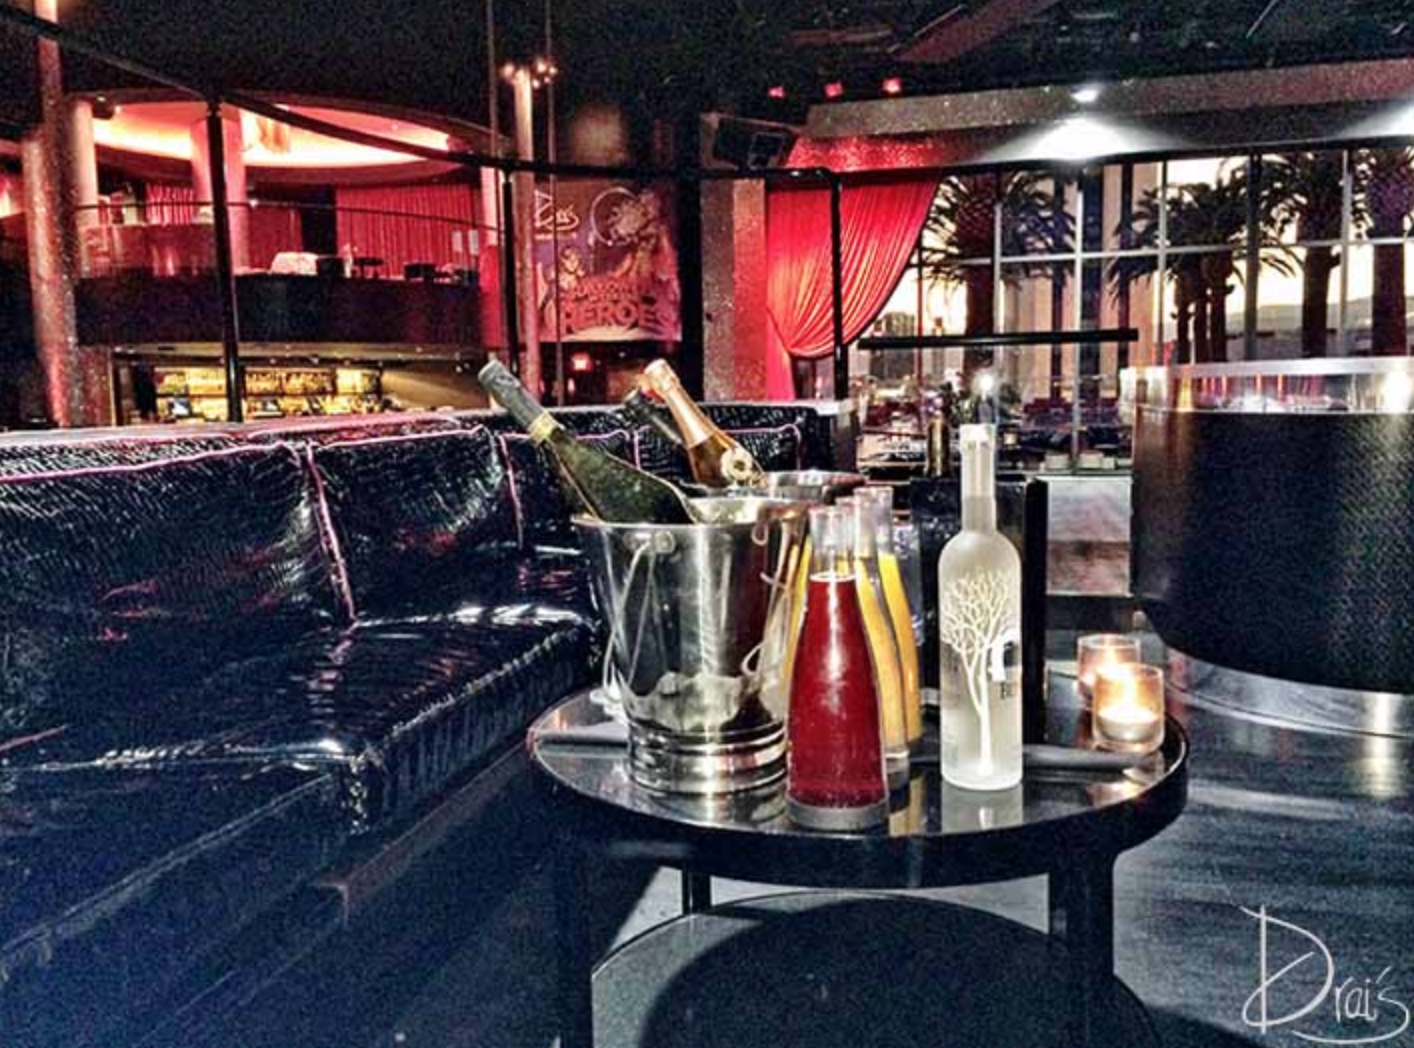 Drai's Nightclub Stage Table